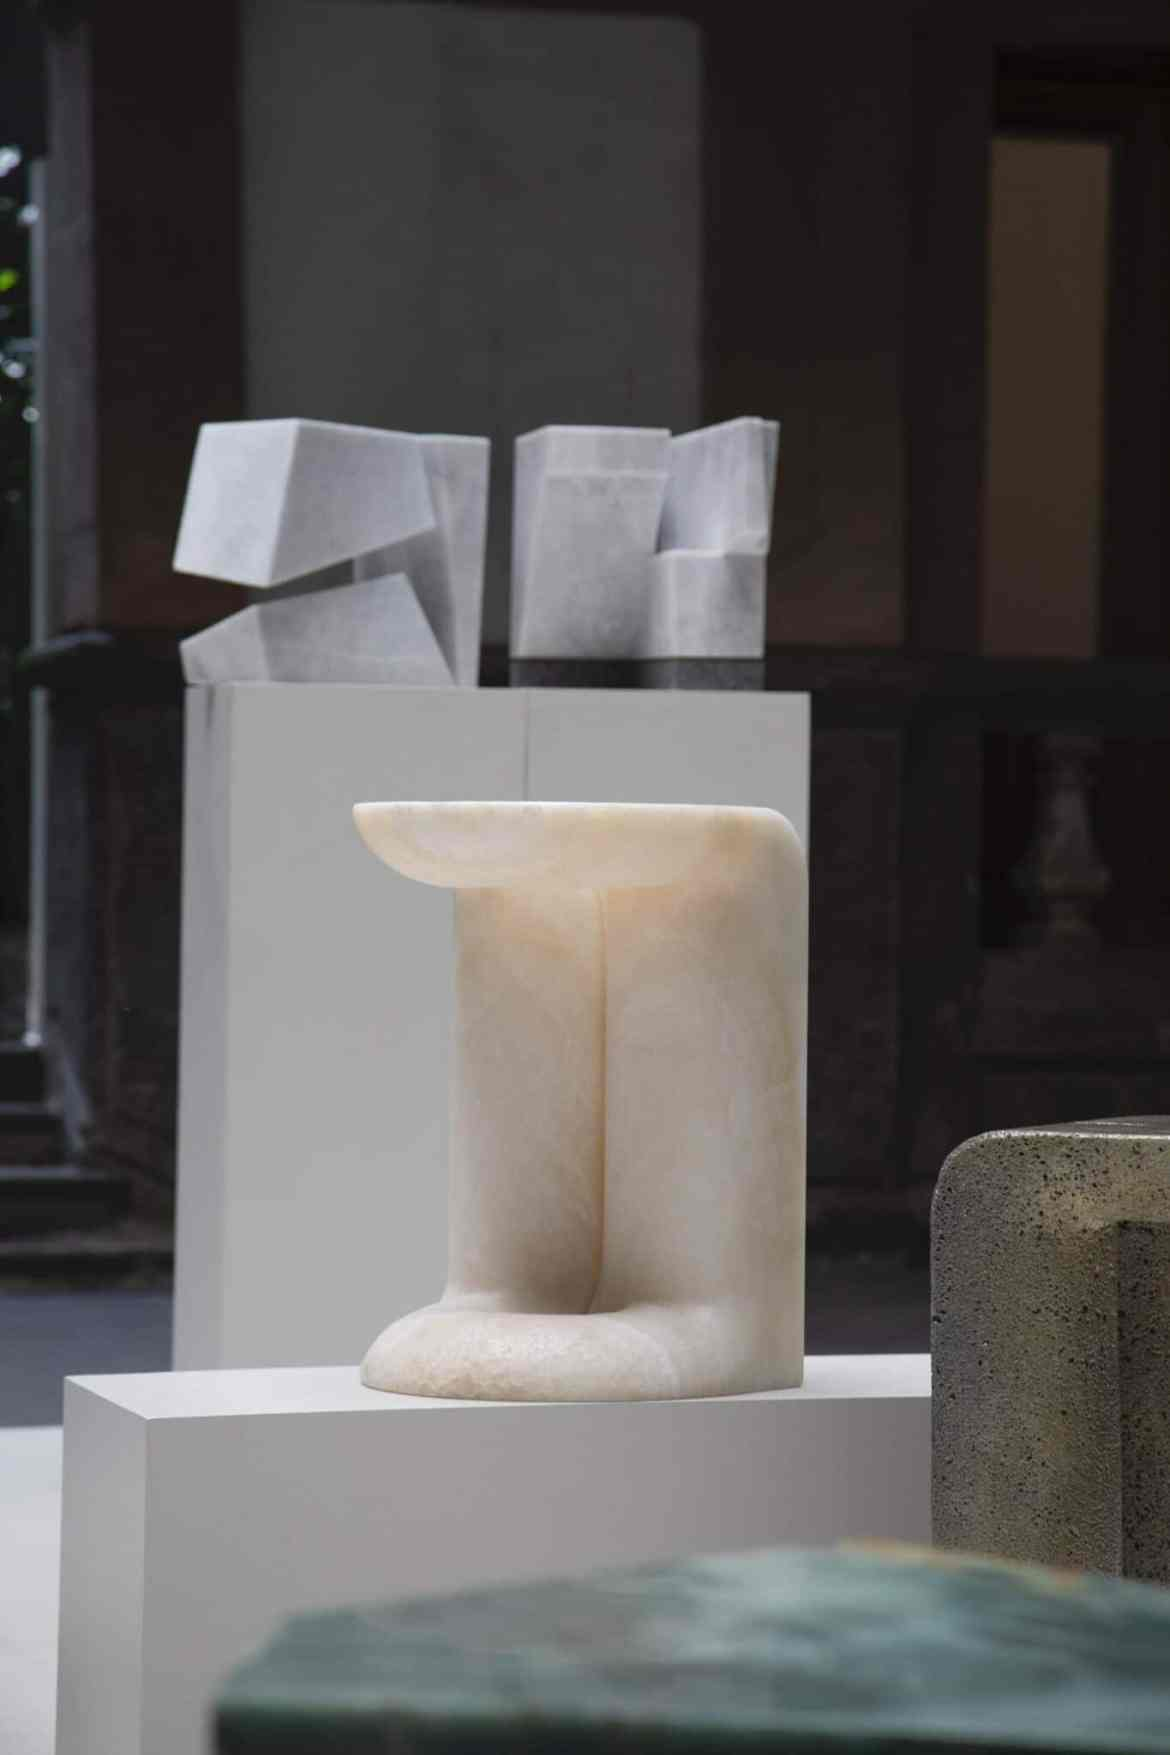 UNNO, digital gallery, presents the work of Ian Felton